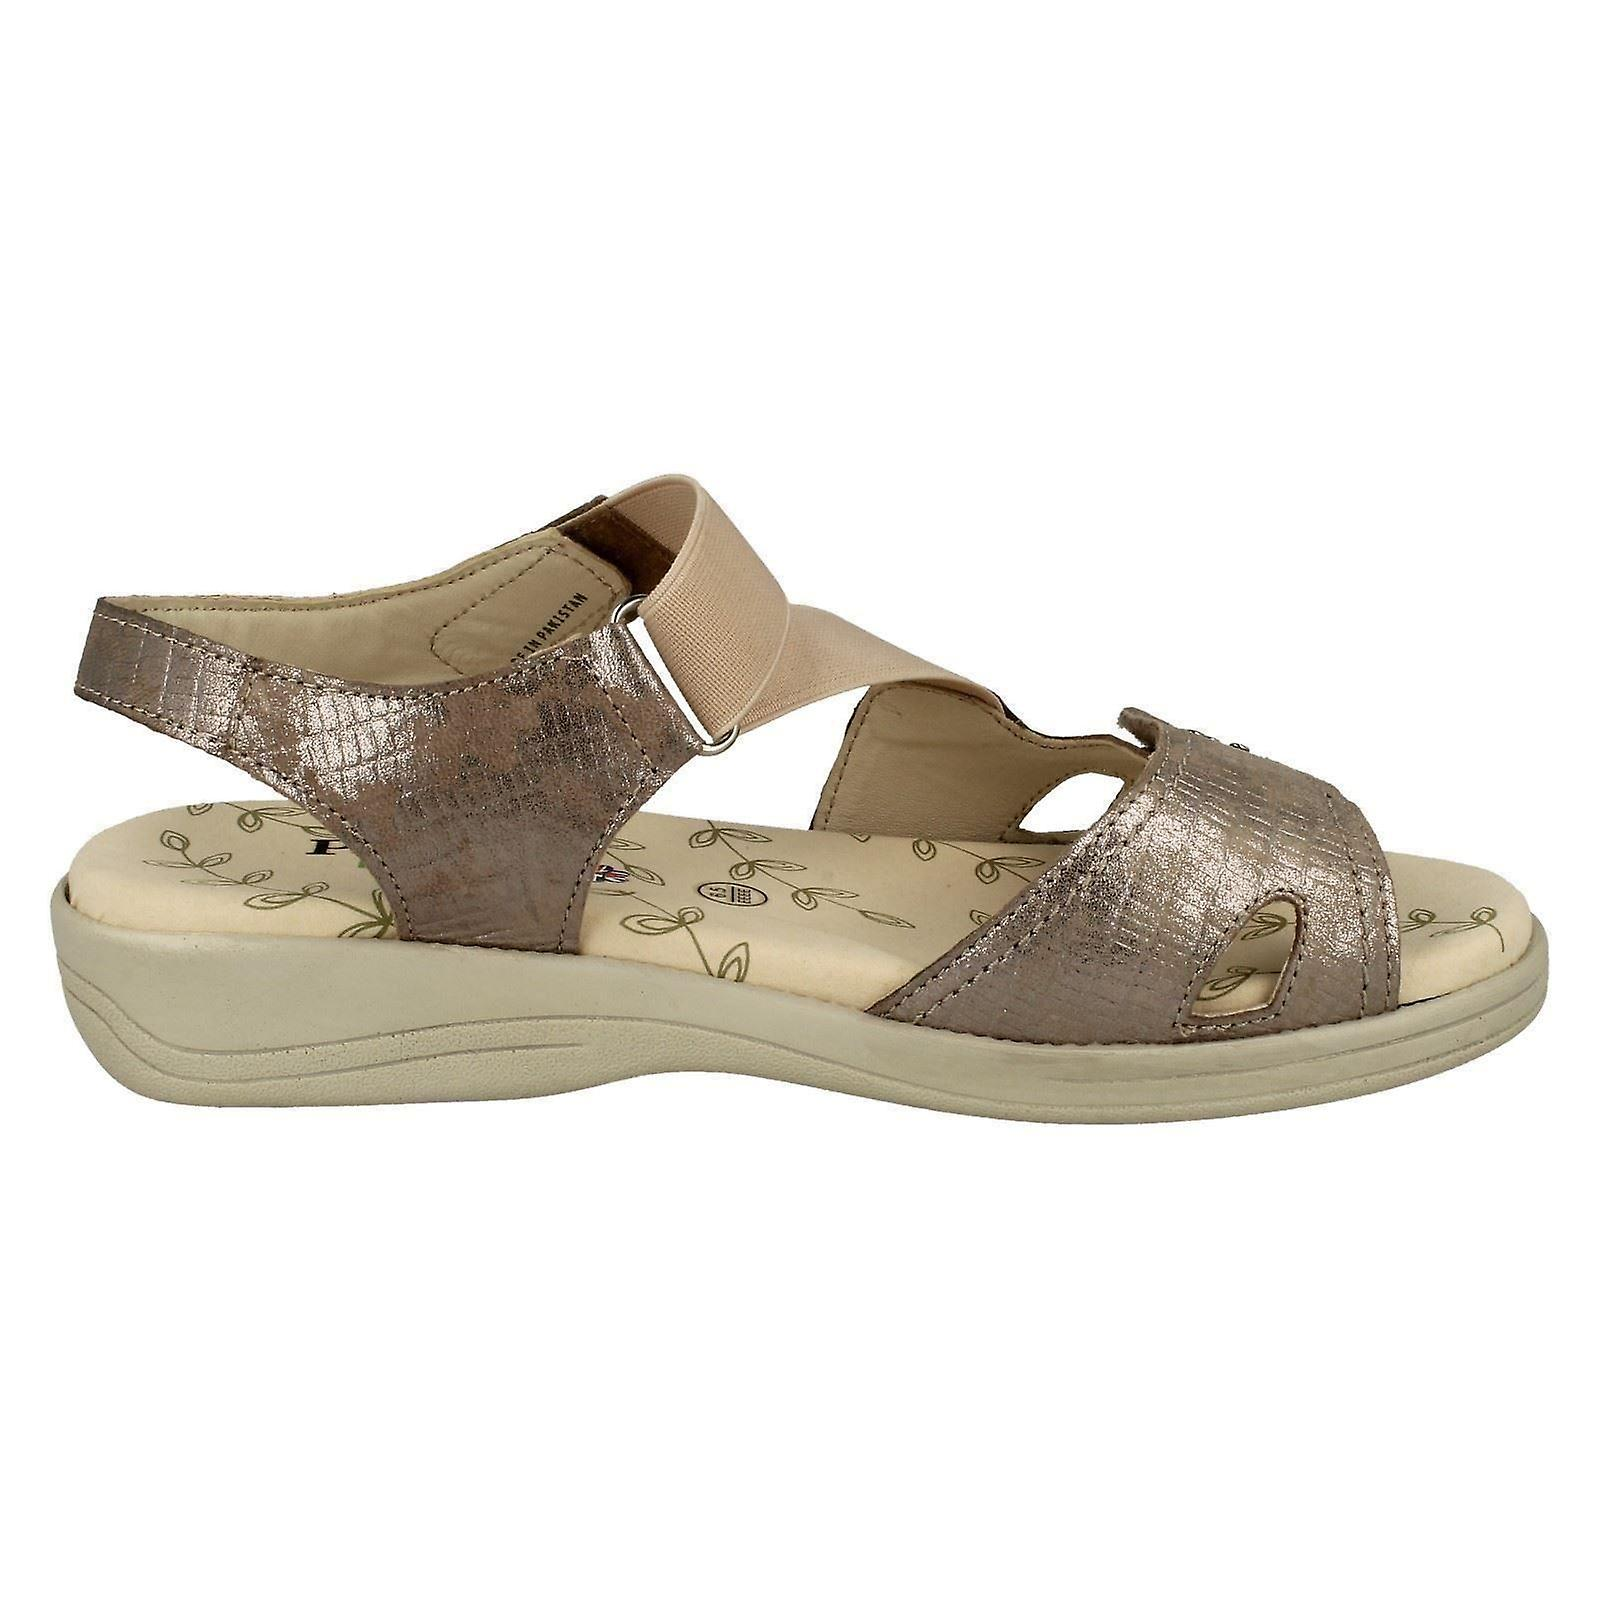 cf33e19e9 Ladies Padders Hook   Loop Fastening Sandals Cruise - Metallic Reptile  Leather - UK Size 7